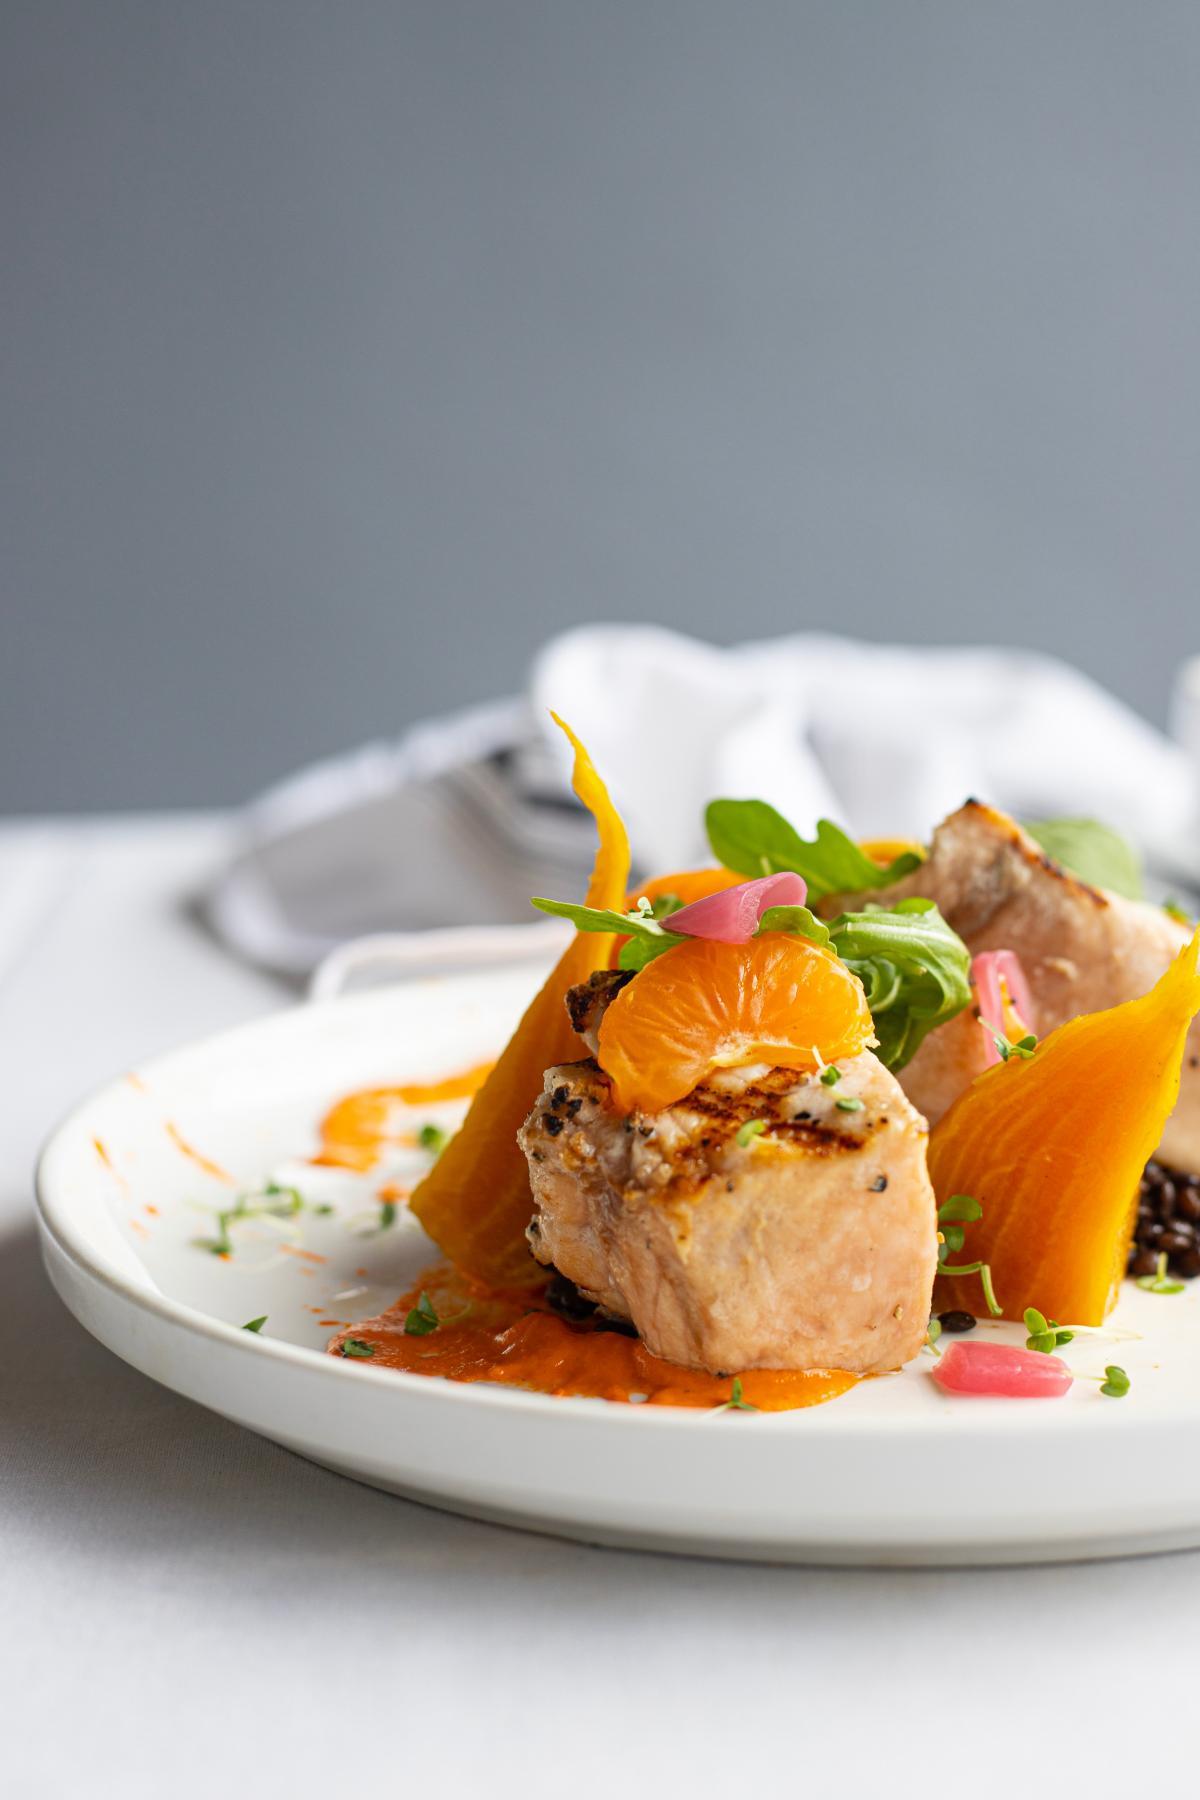 Plate Food Meal #420171